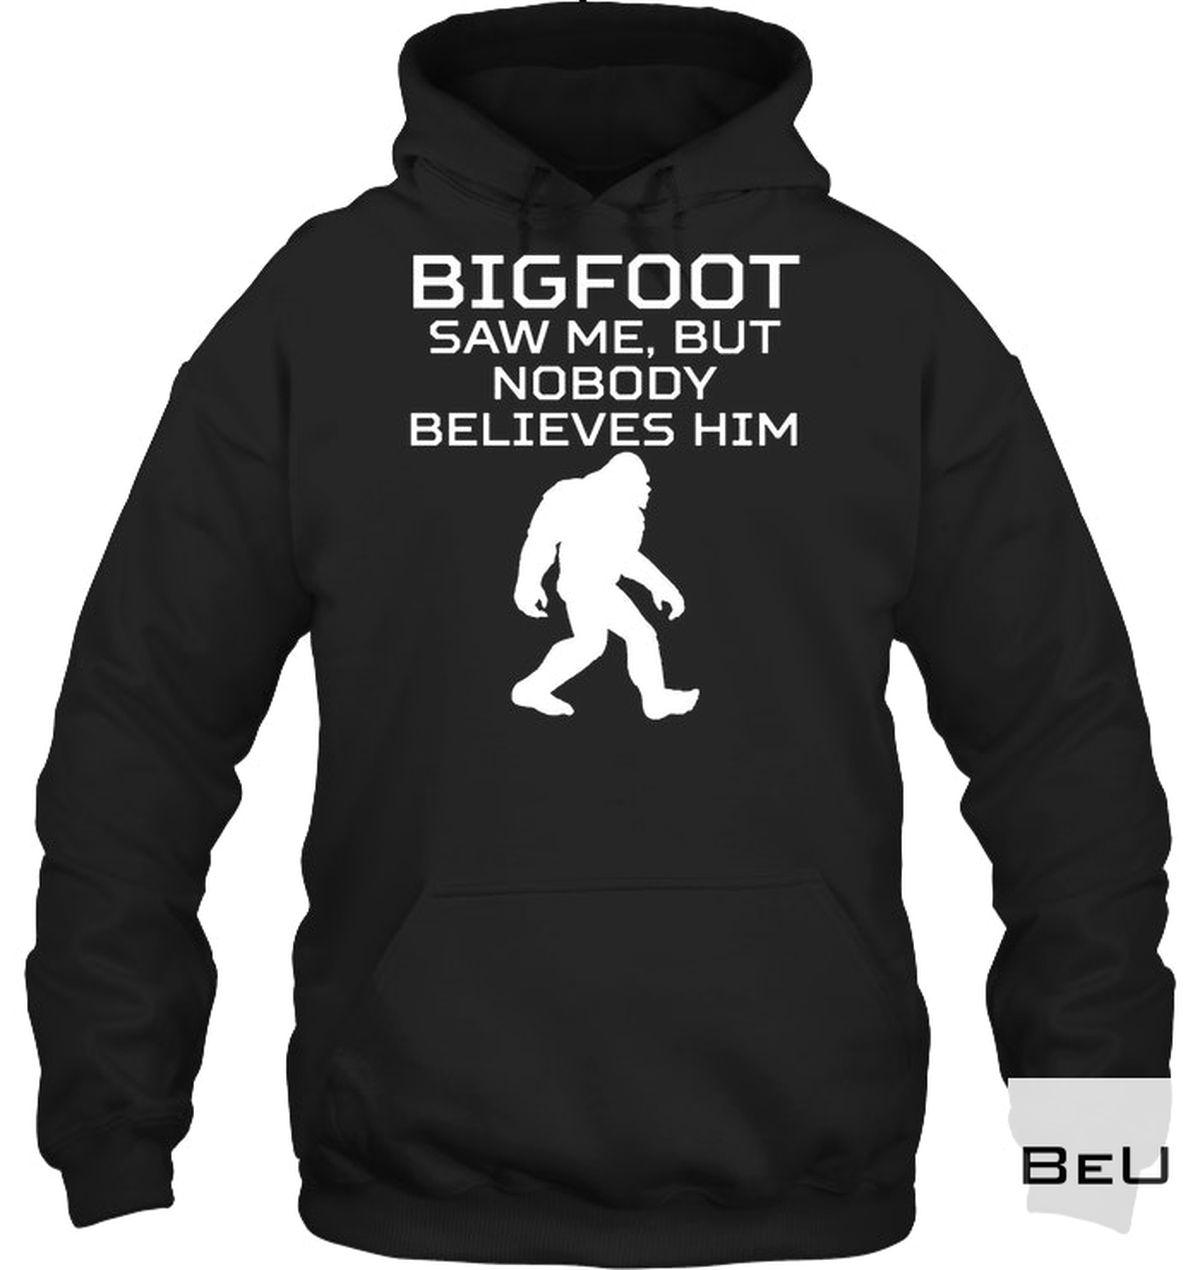 Bigfoot Saw Me, But Nobody Believes Him Shirt a